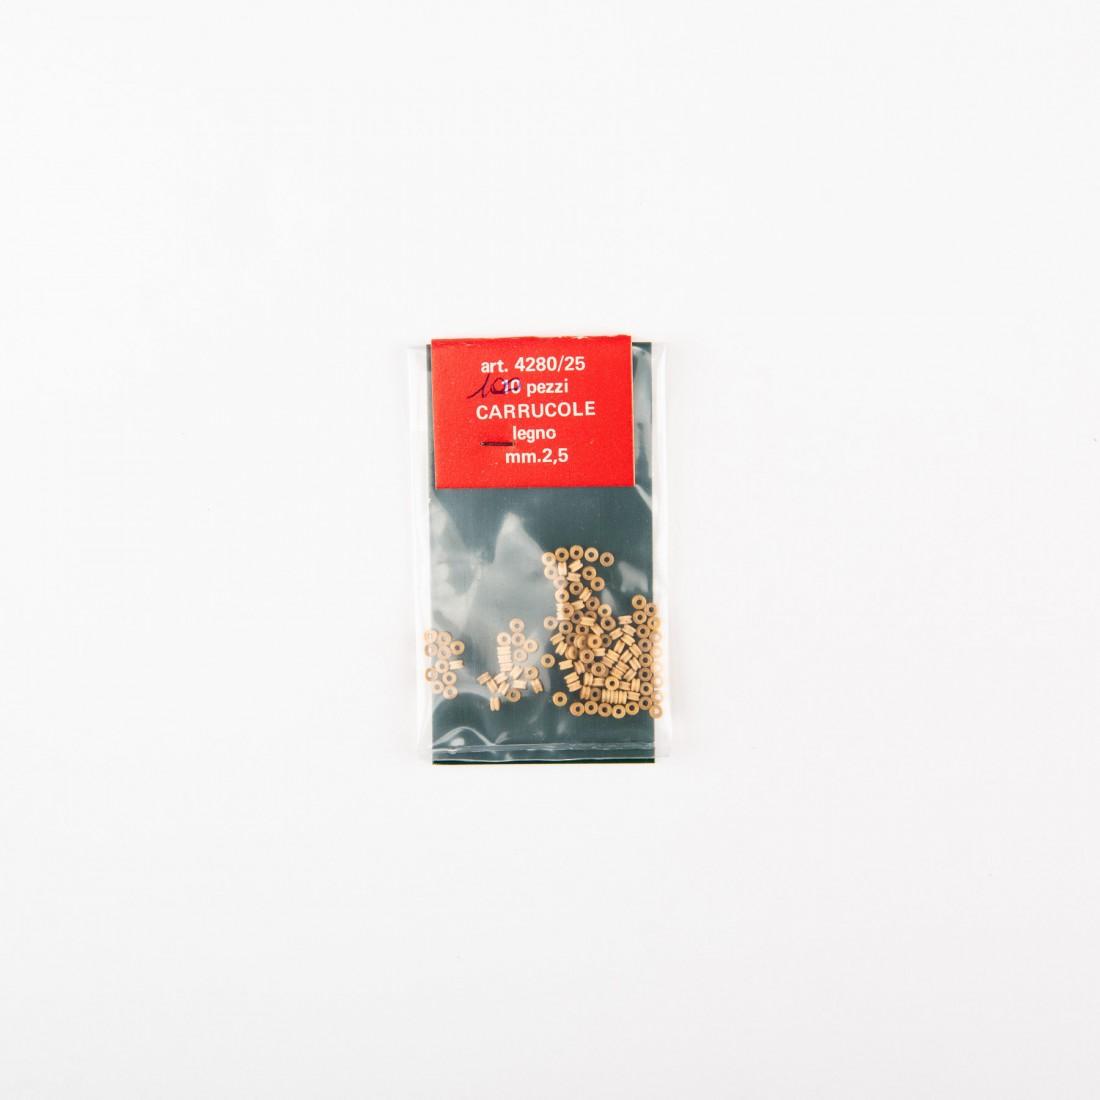 Poulies en bois mm.2,5